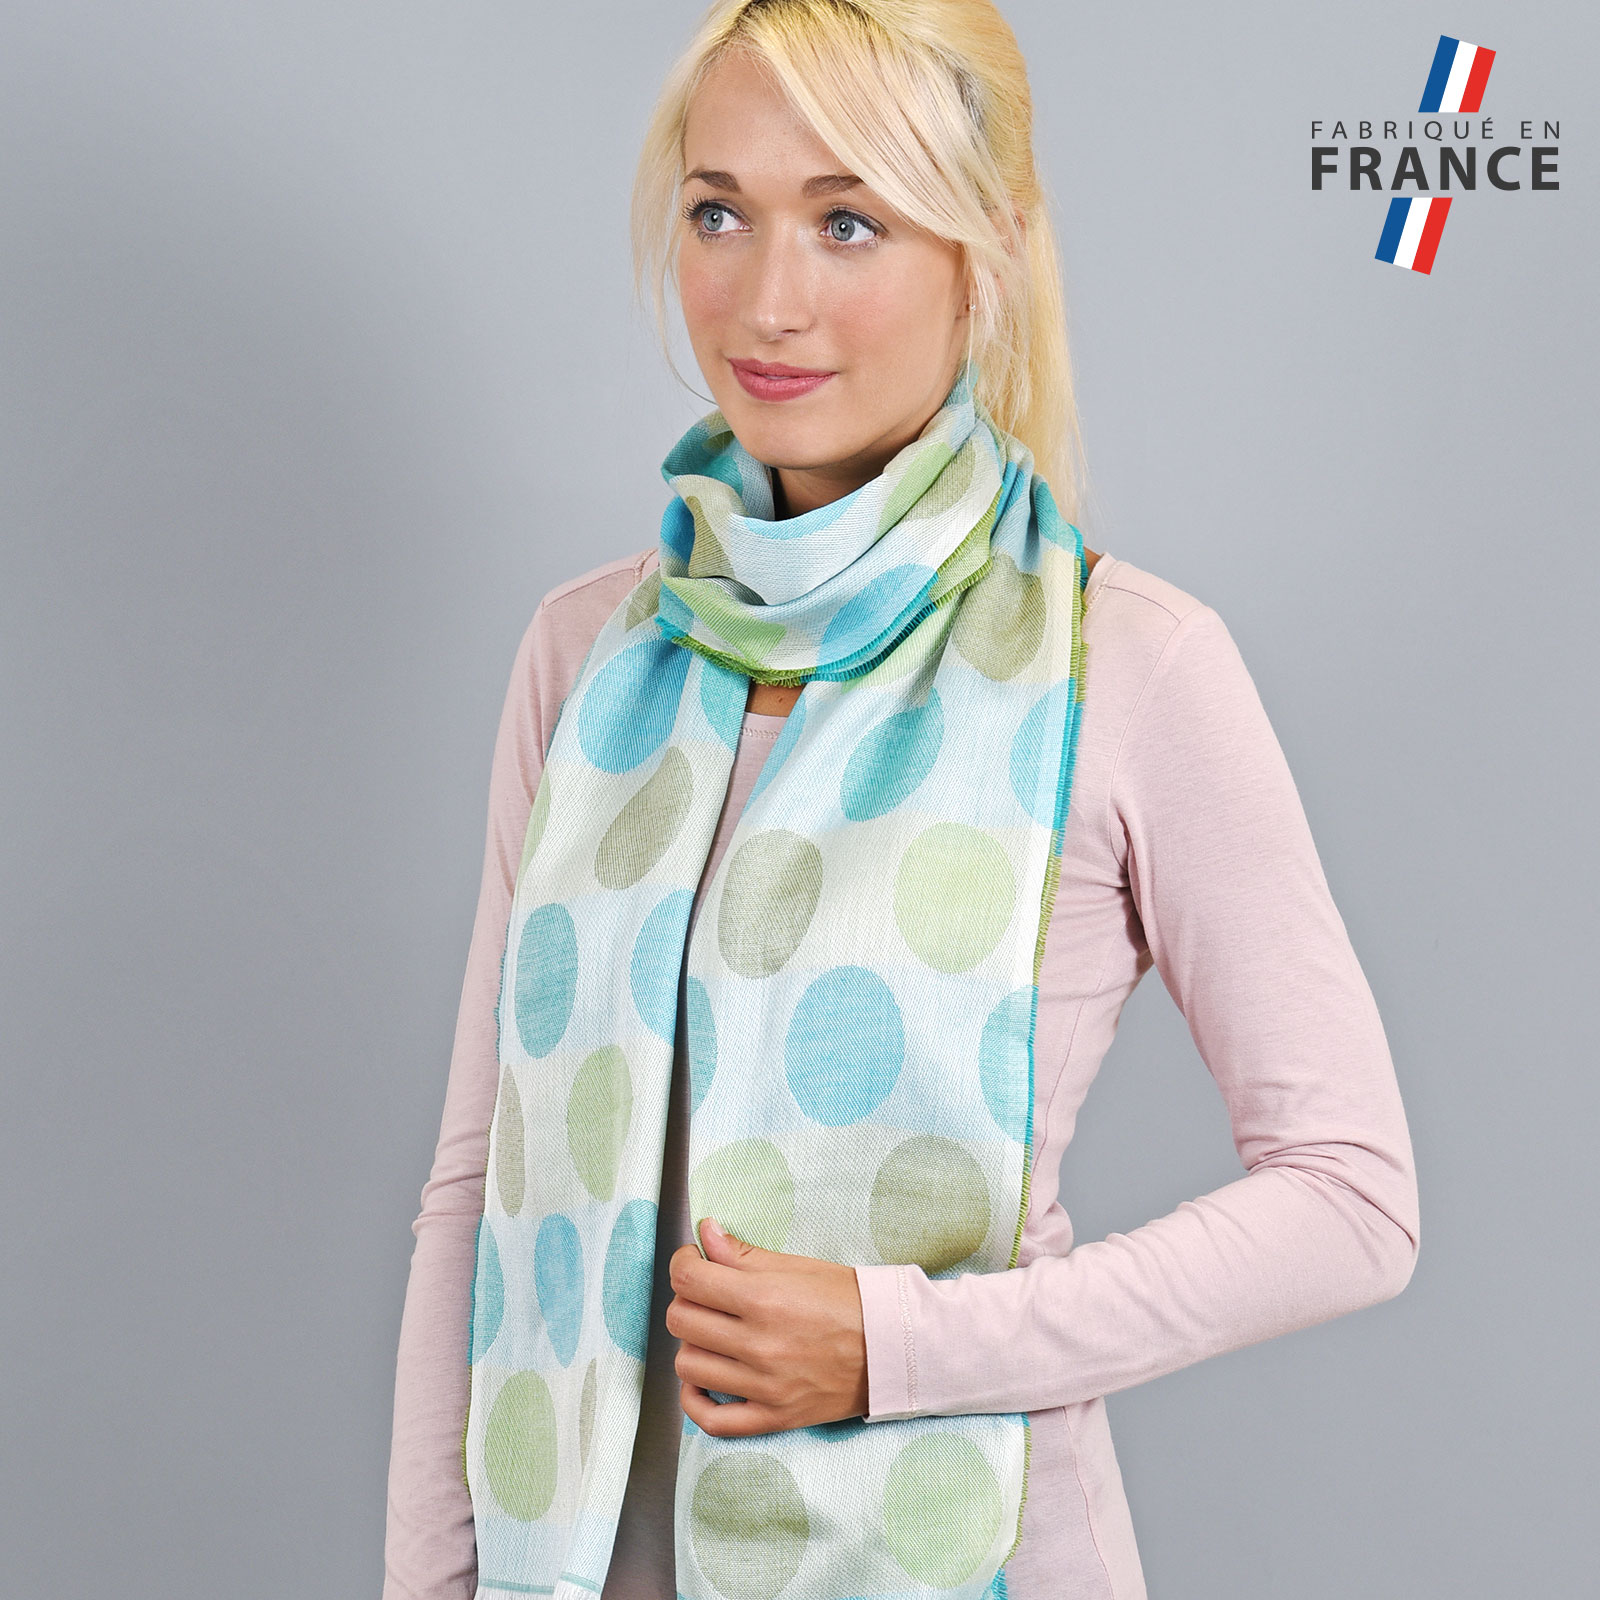 AT-04285-VF16-LB_FR-echarpe-legere-bulles-bleu-vert-fabrique-en-france